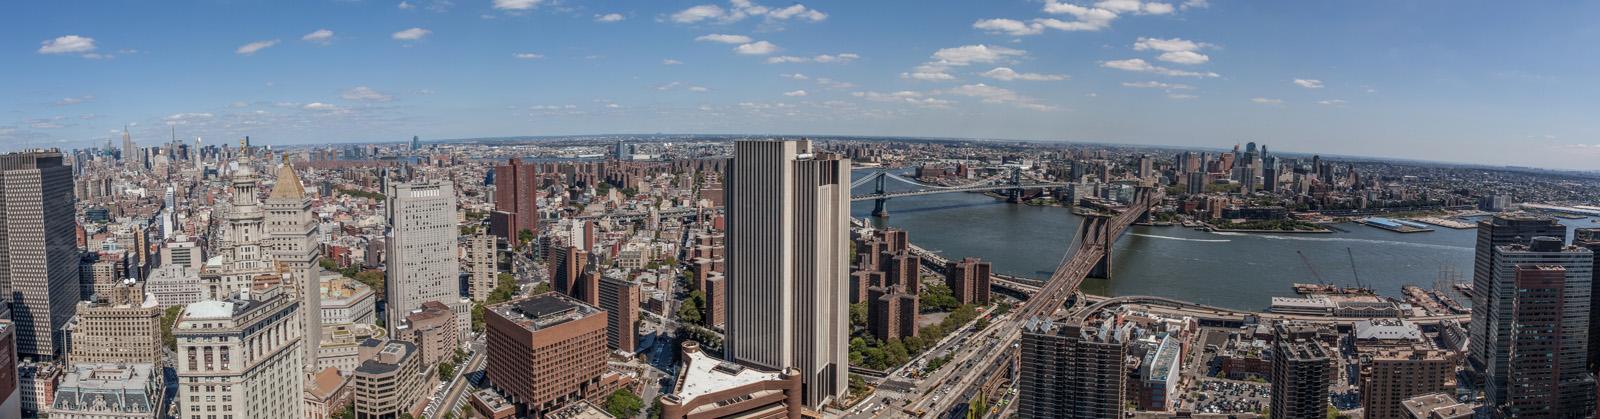 Things to do near Brooklyn Bridge: guide